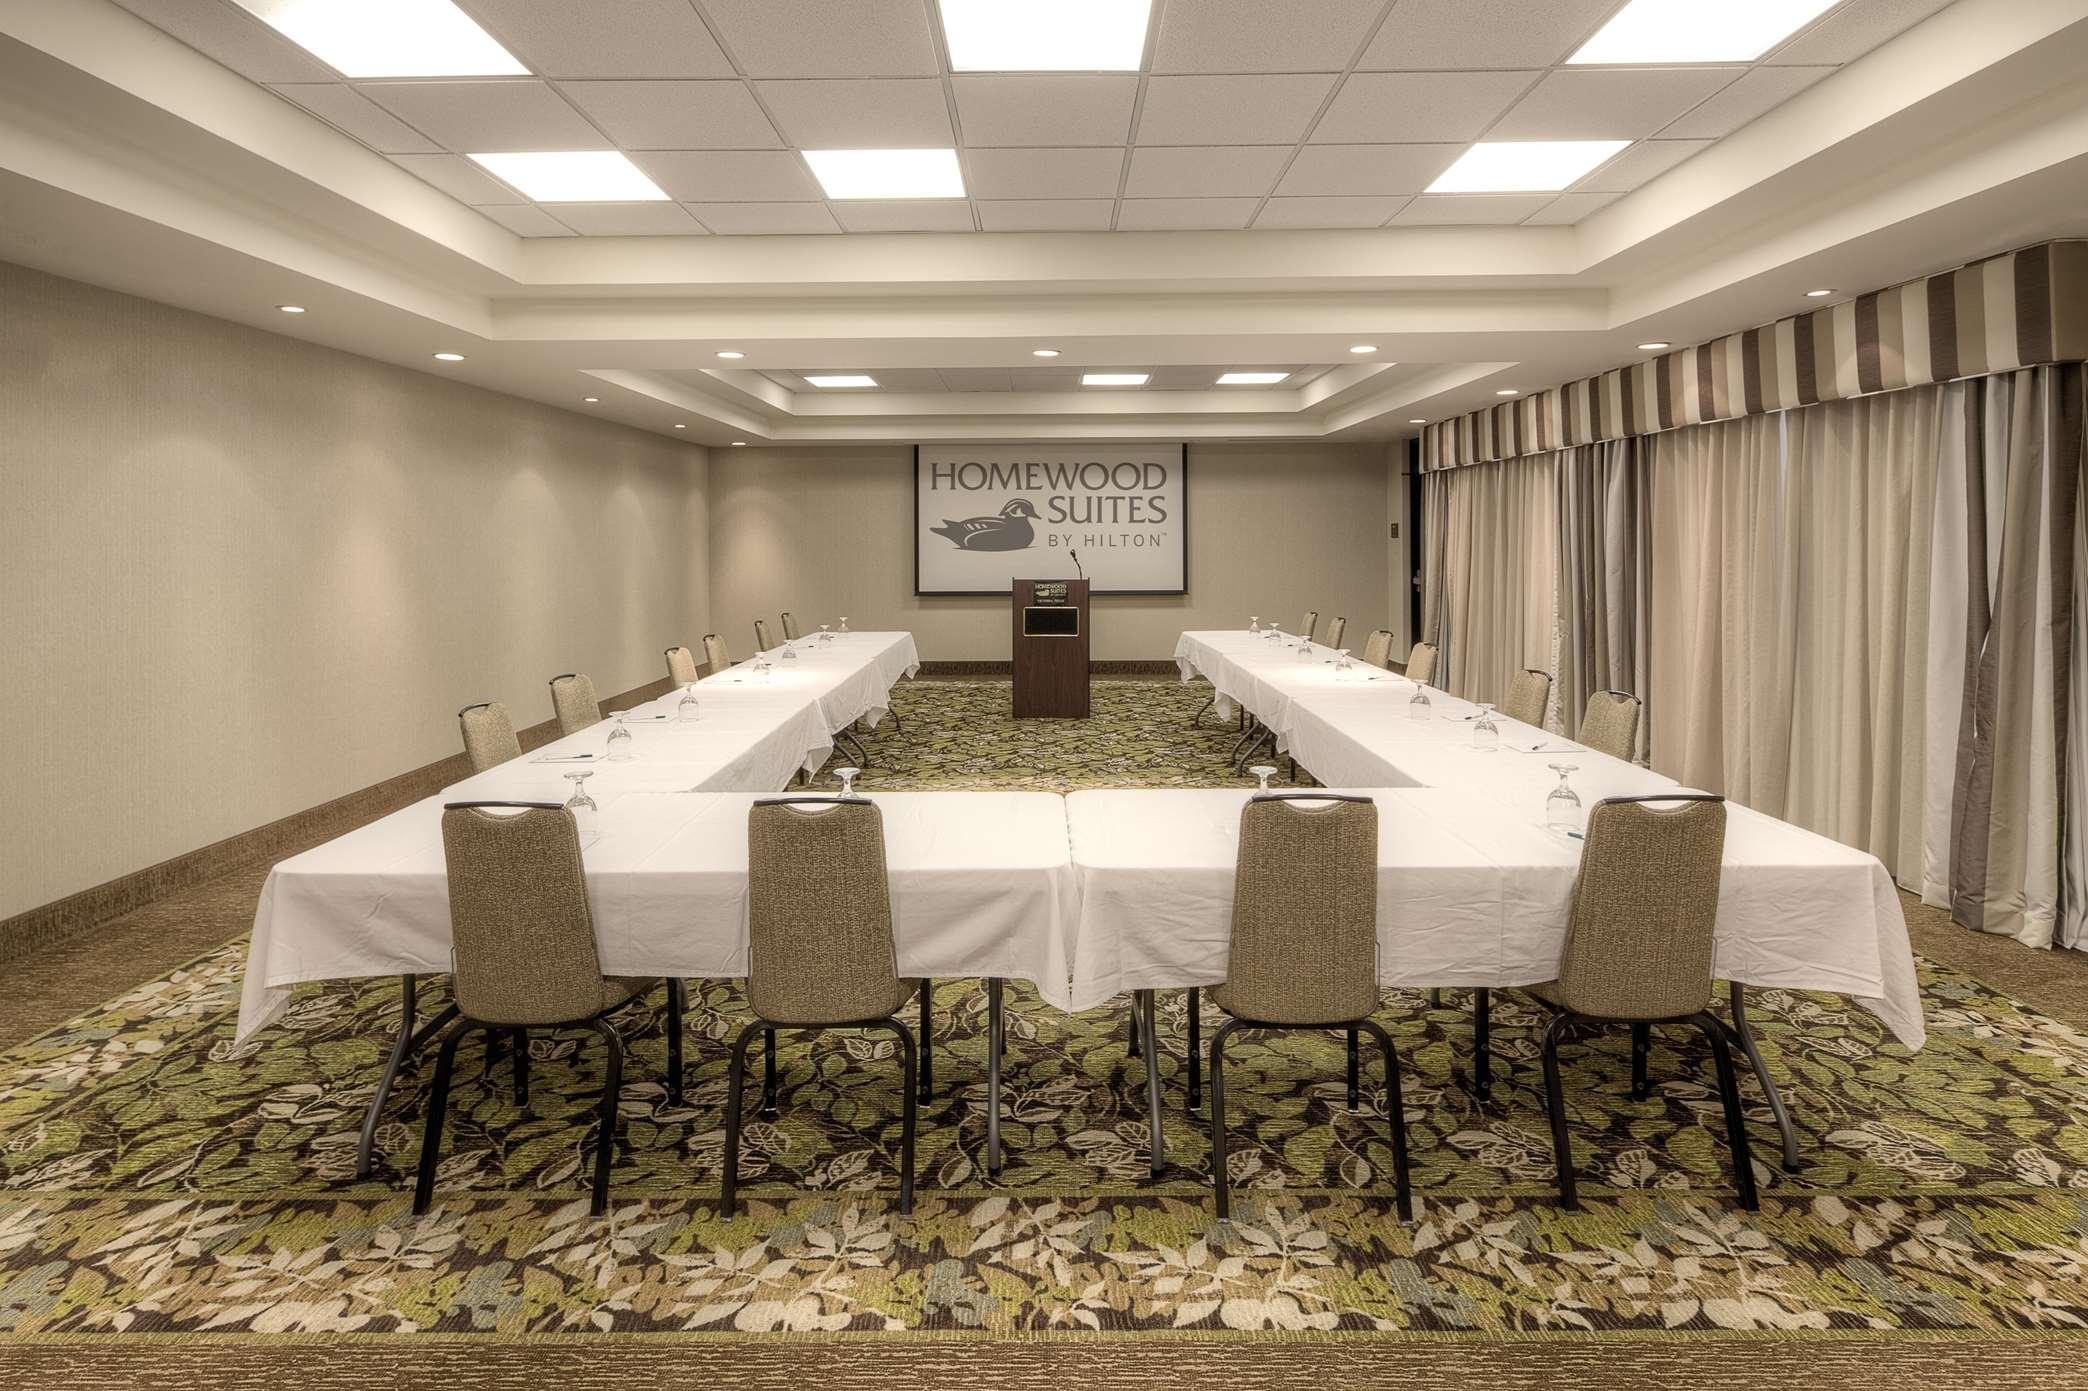 Homewood Suites by Hilton Victoria, TX image 14